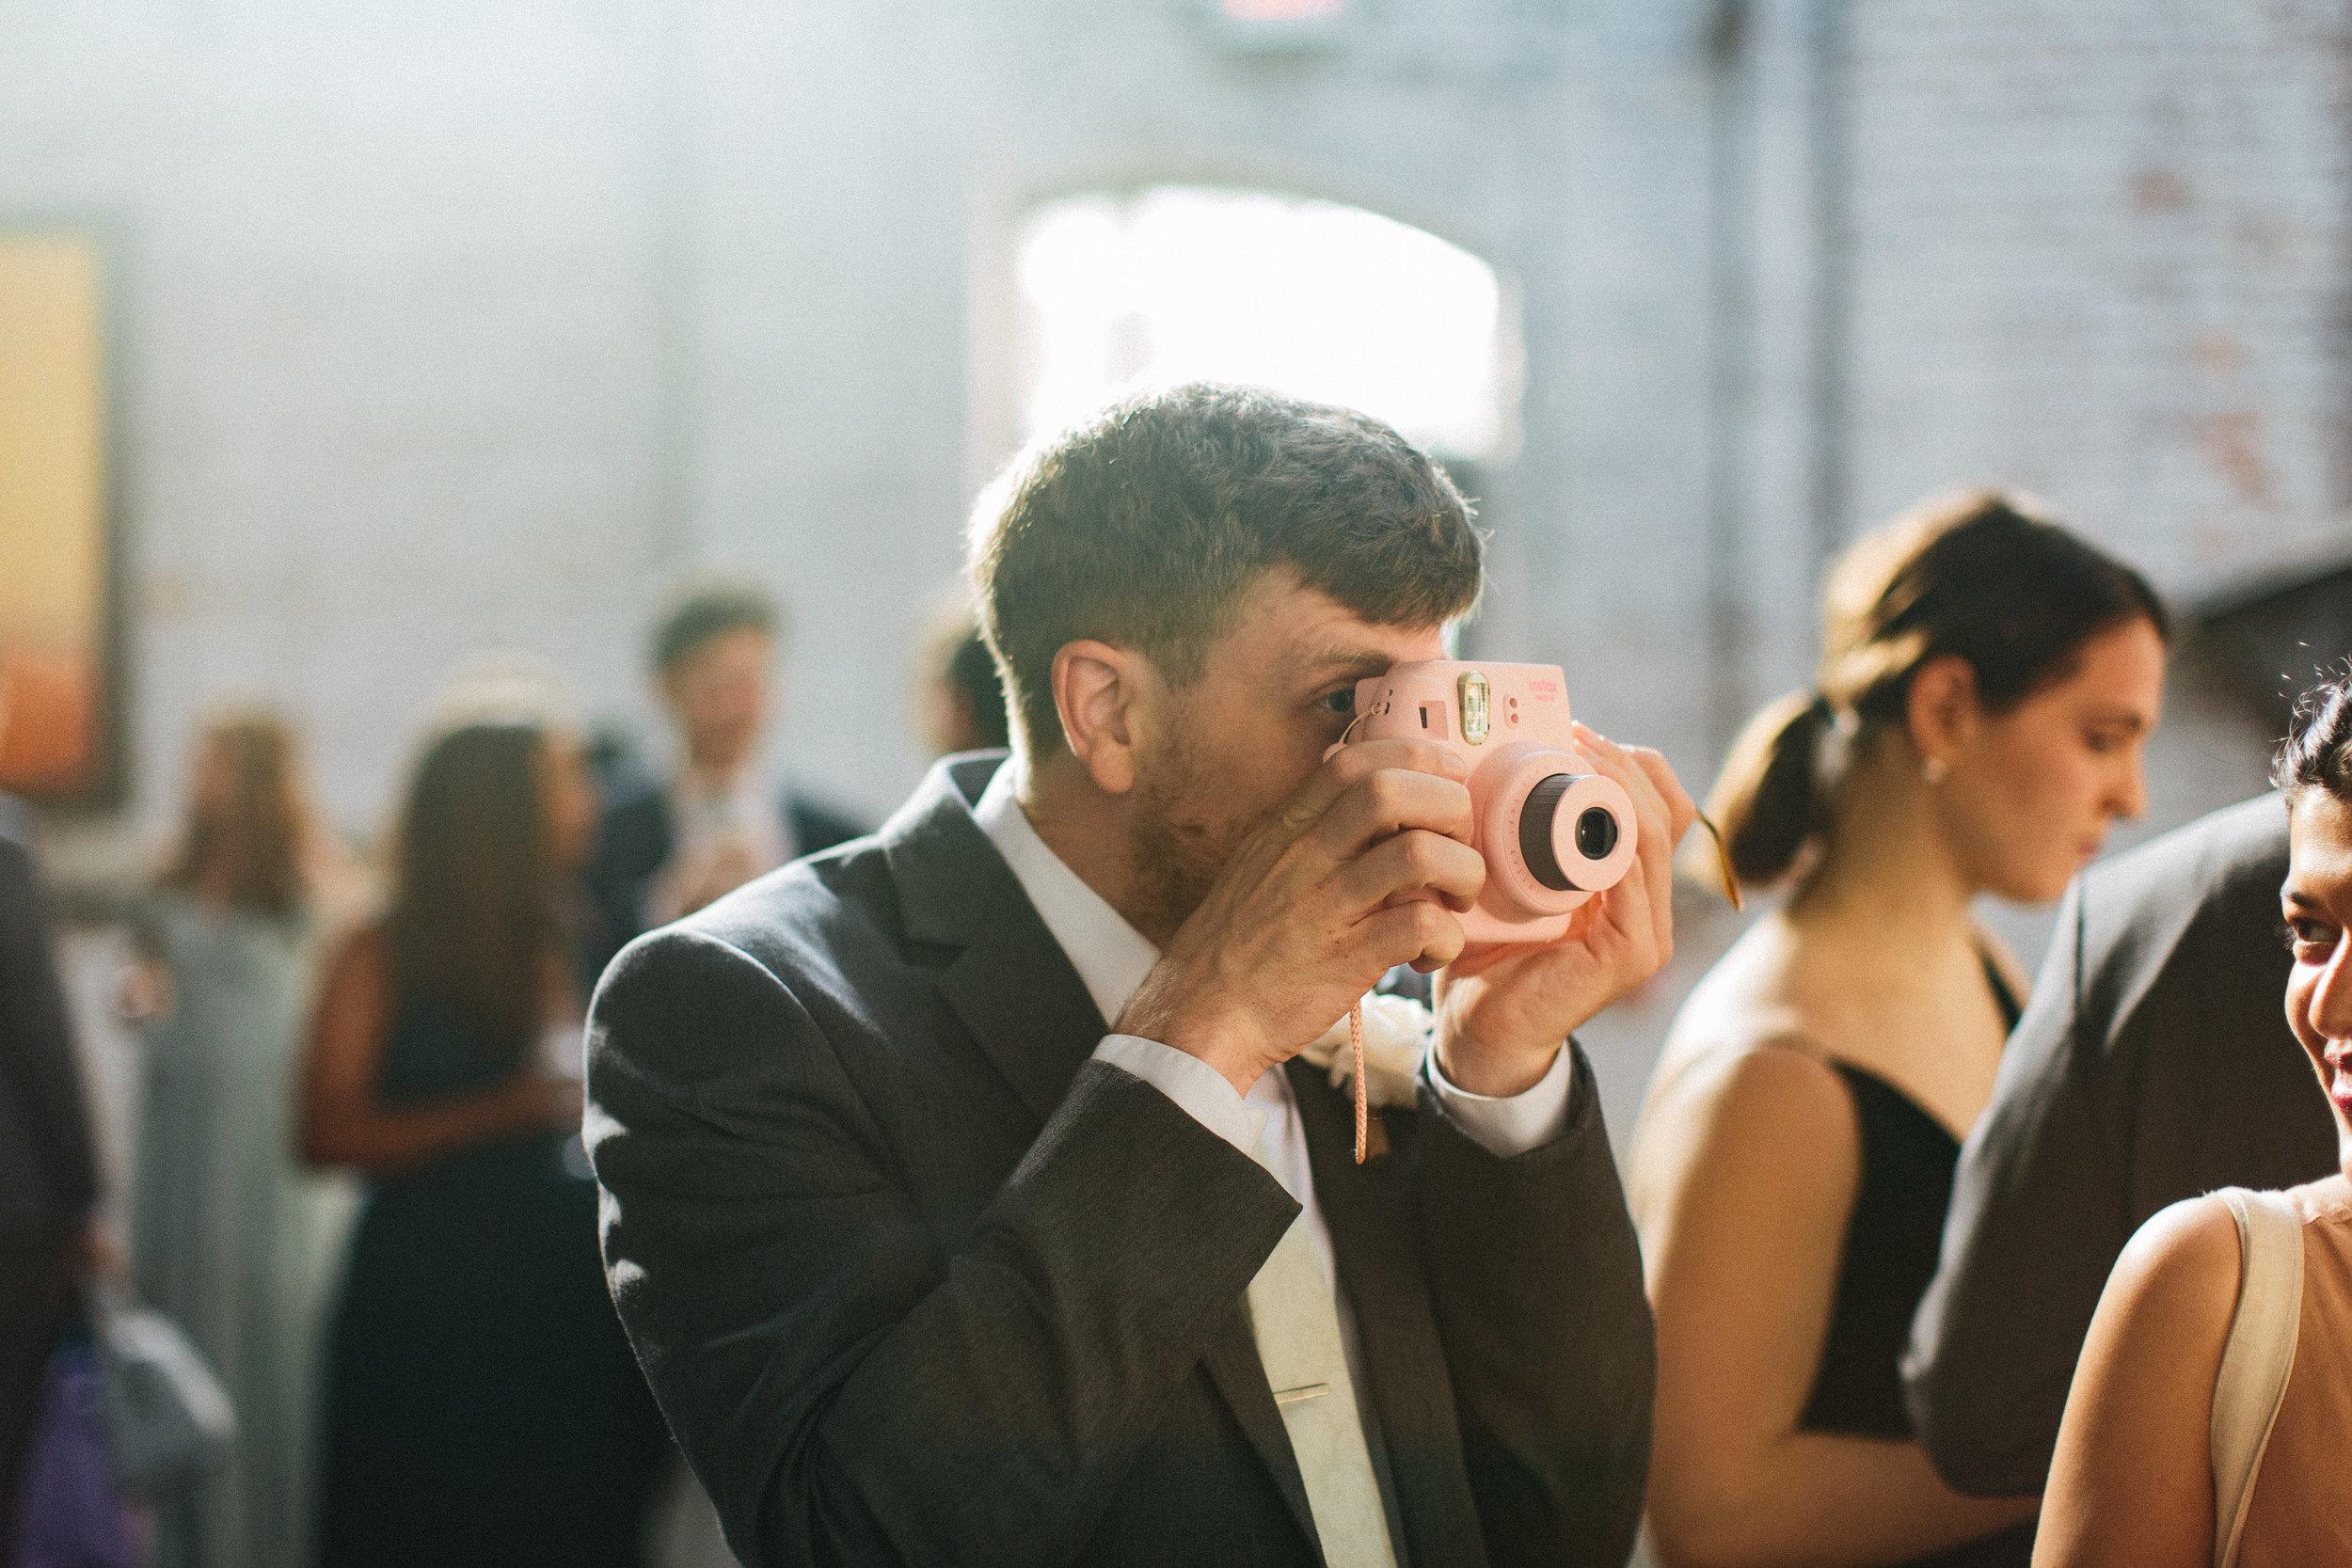 king_plow_atlanta_wedding_art_gallery_modern_lifestyle_documentary_1751.jpg